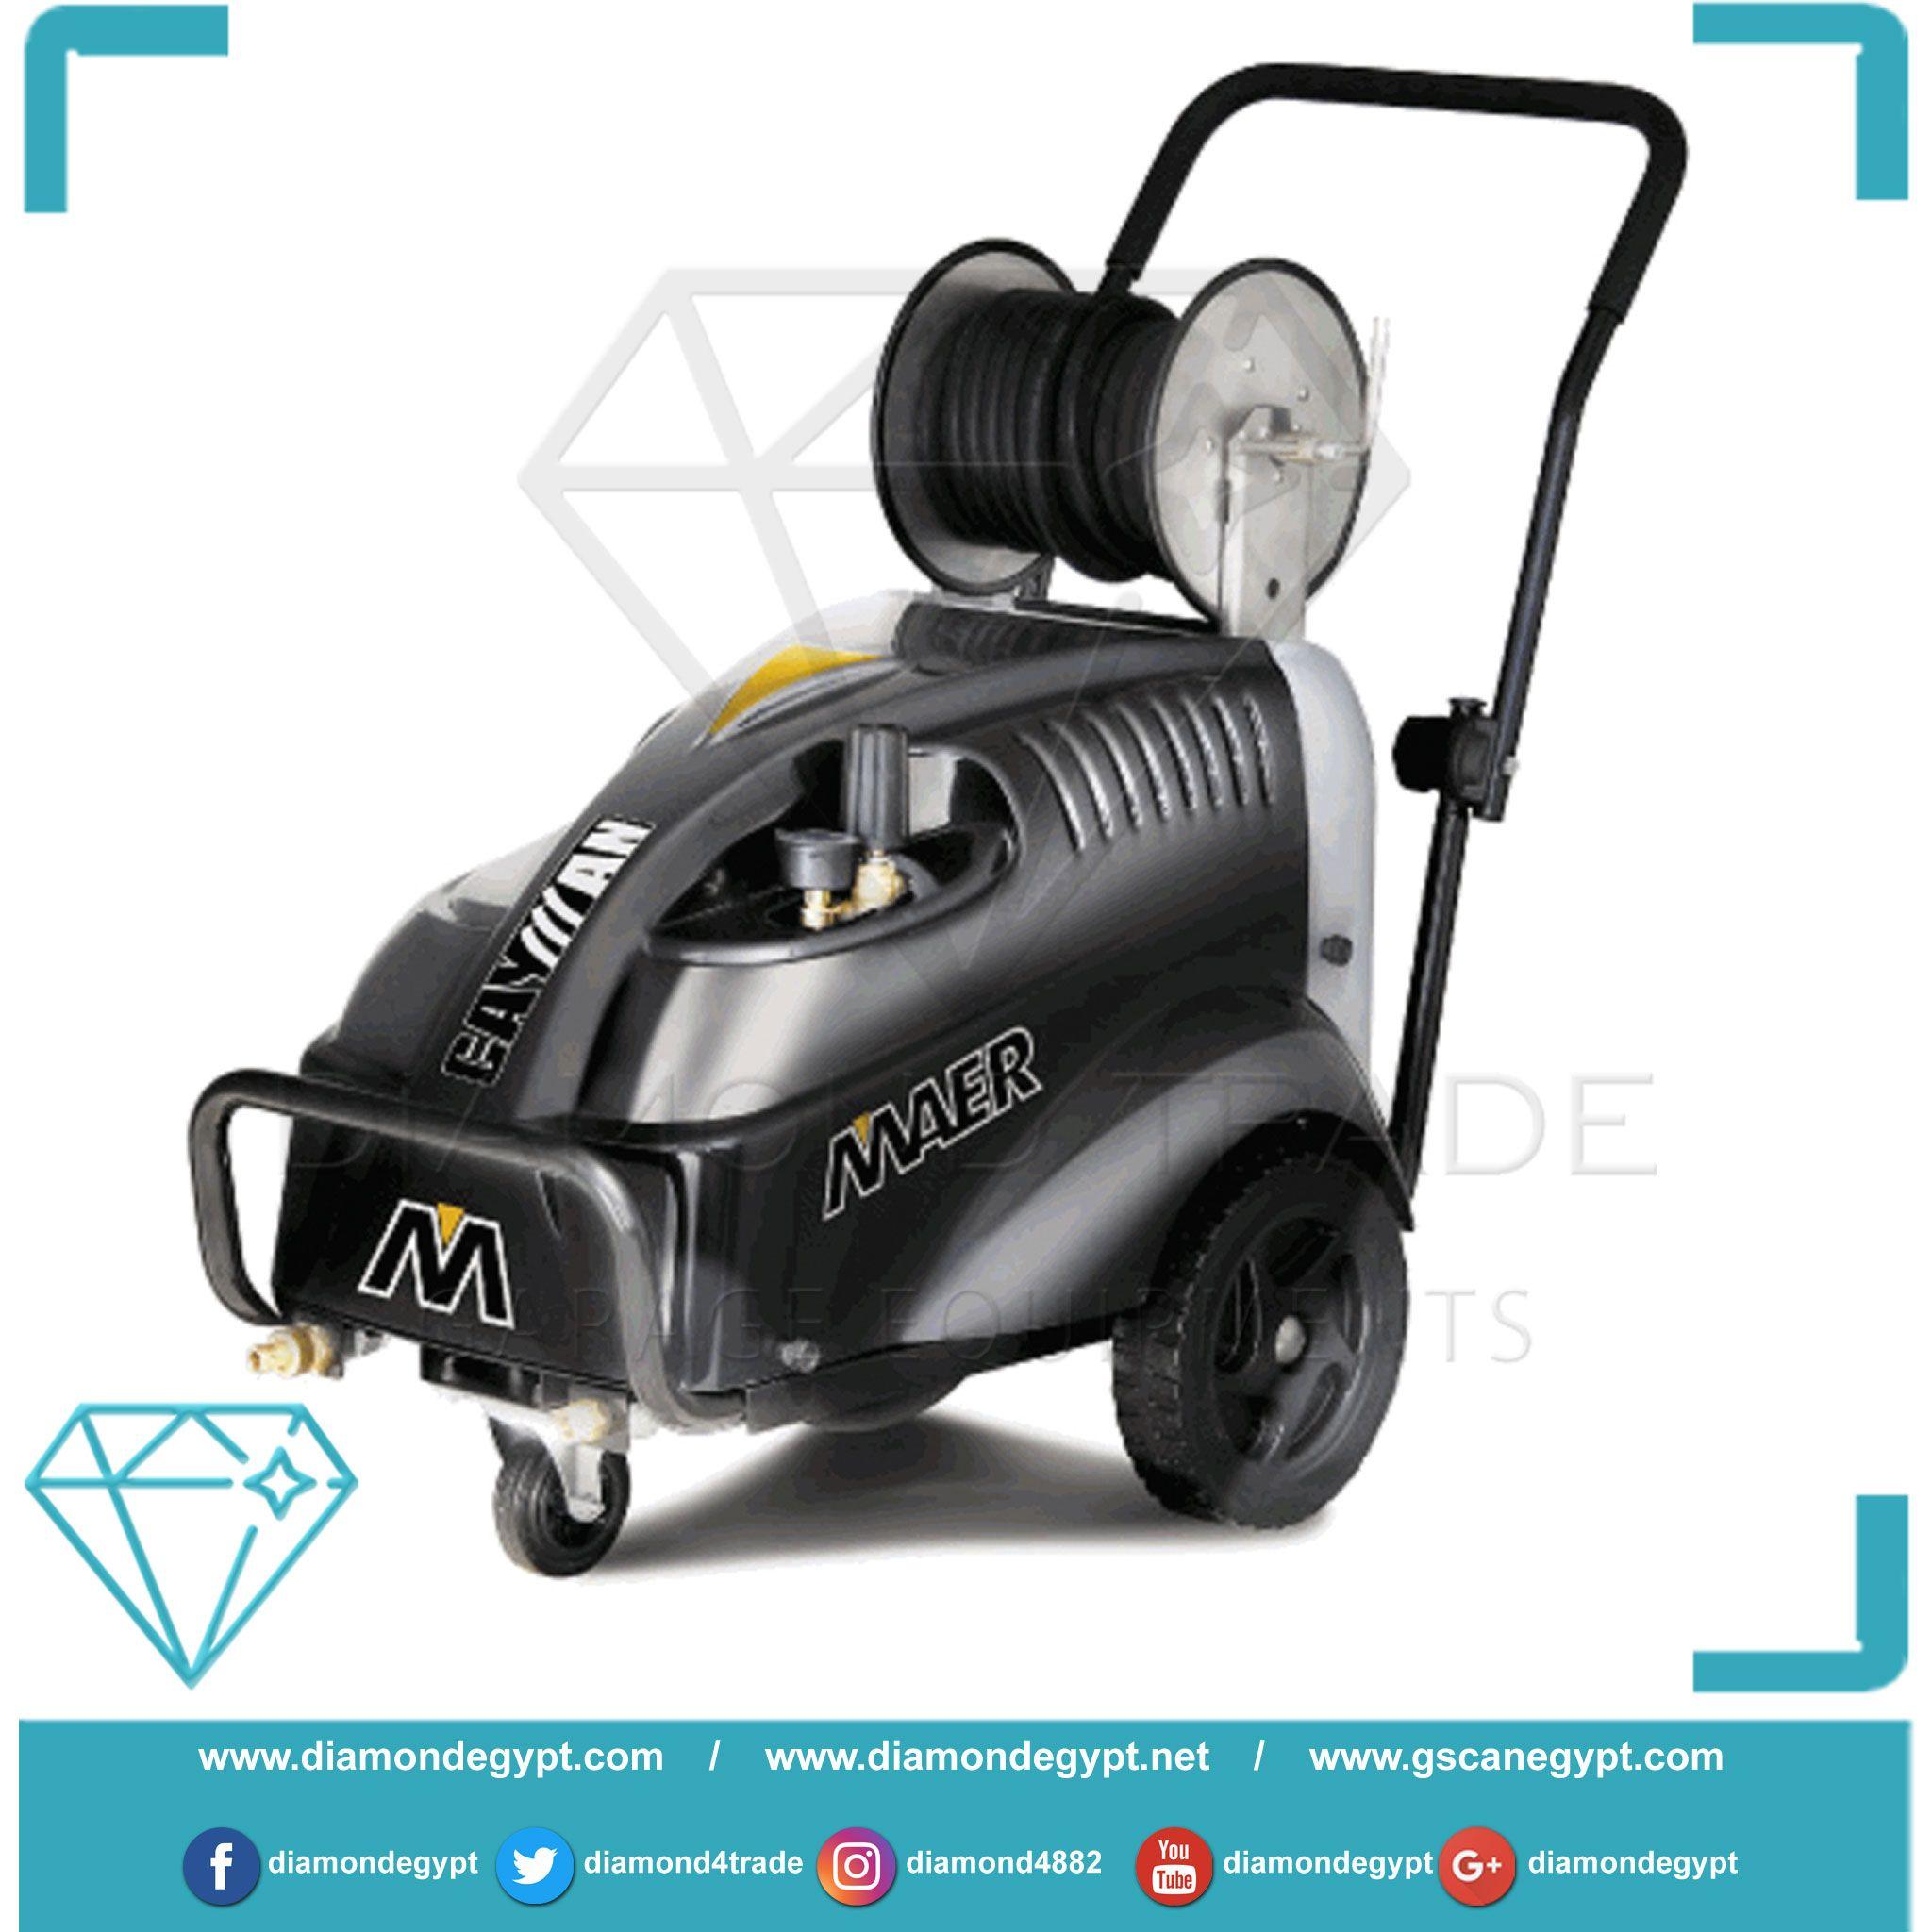 Cayman 200 ماكينه غسيل Outdoor Power Equipment Lawn Mower Push Lawnmower